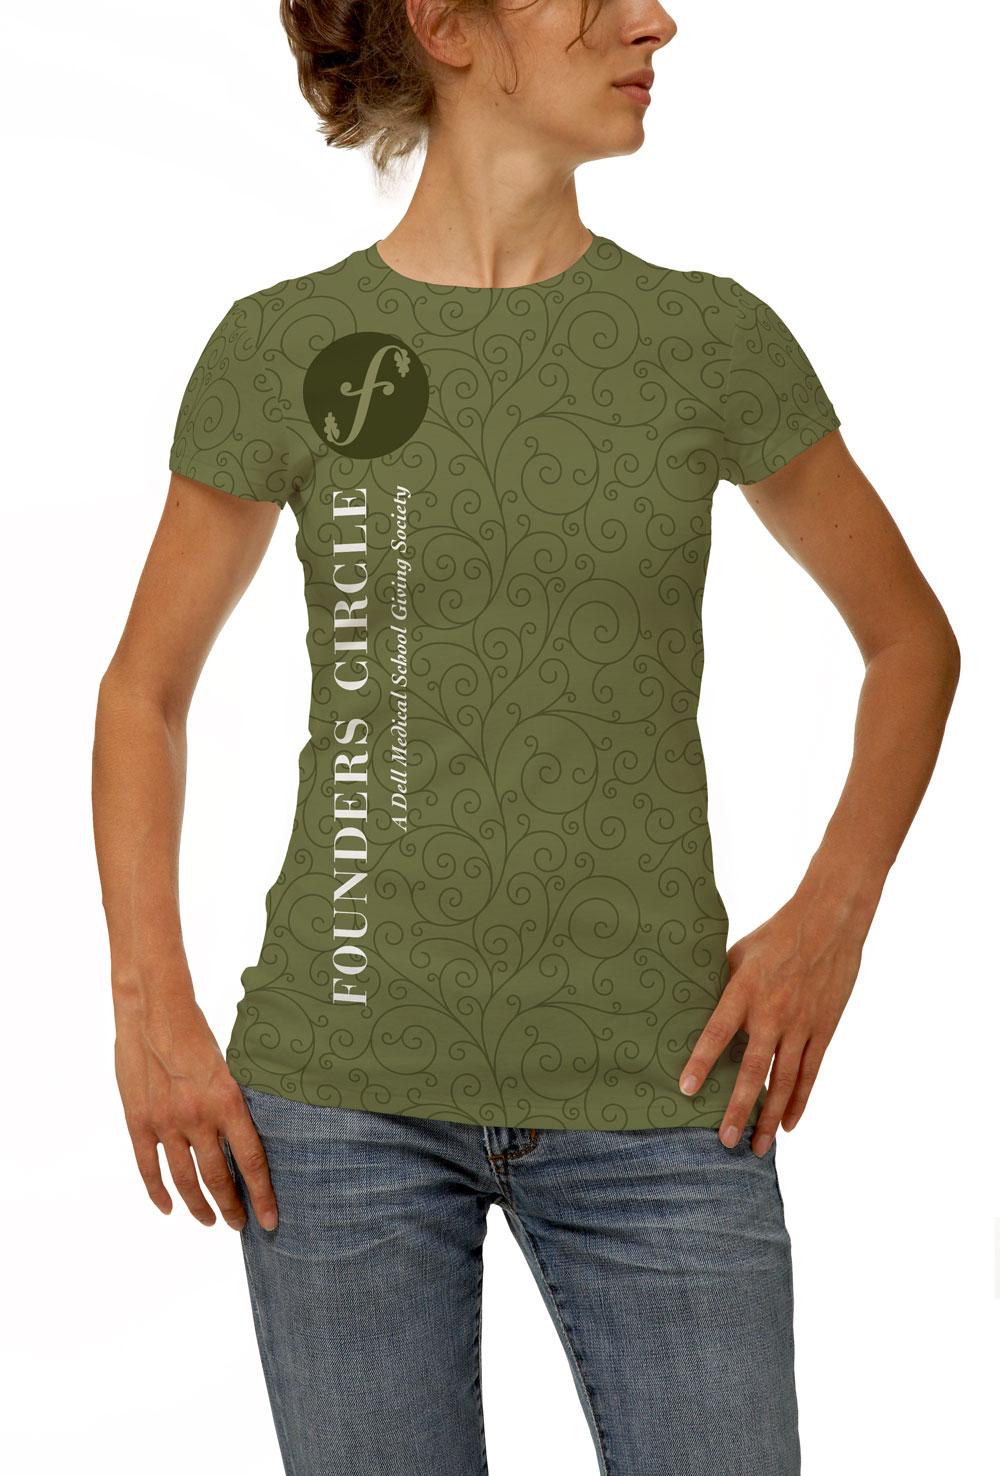 founders-circle-green-tshirt.jpg